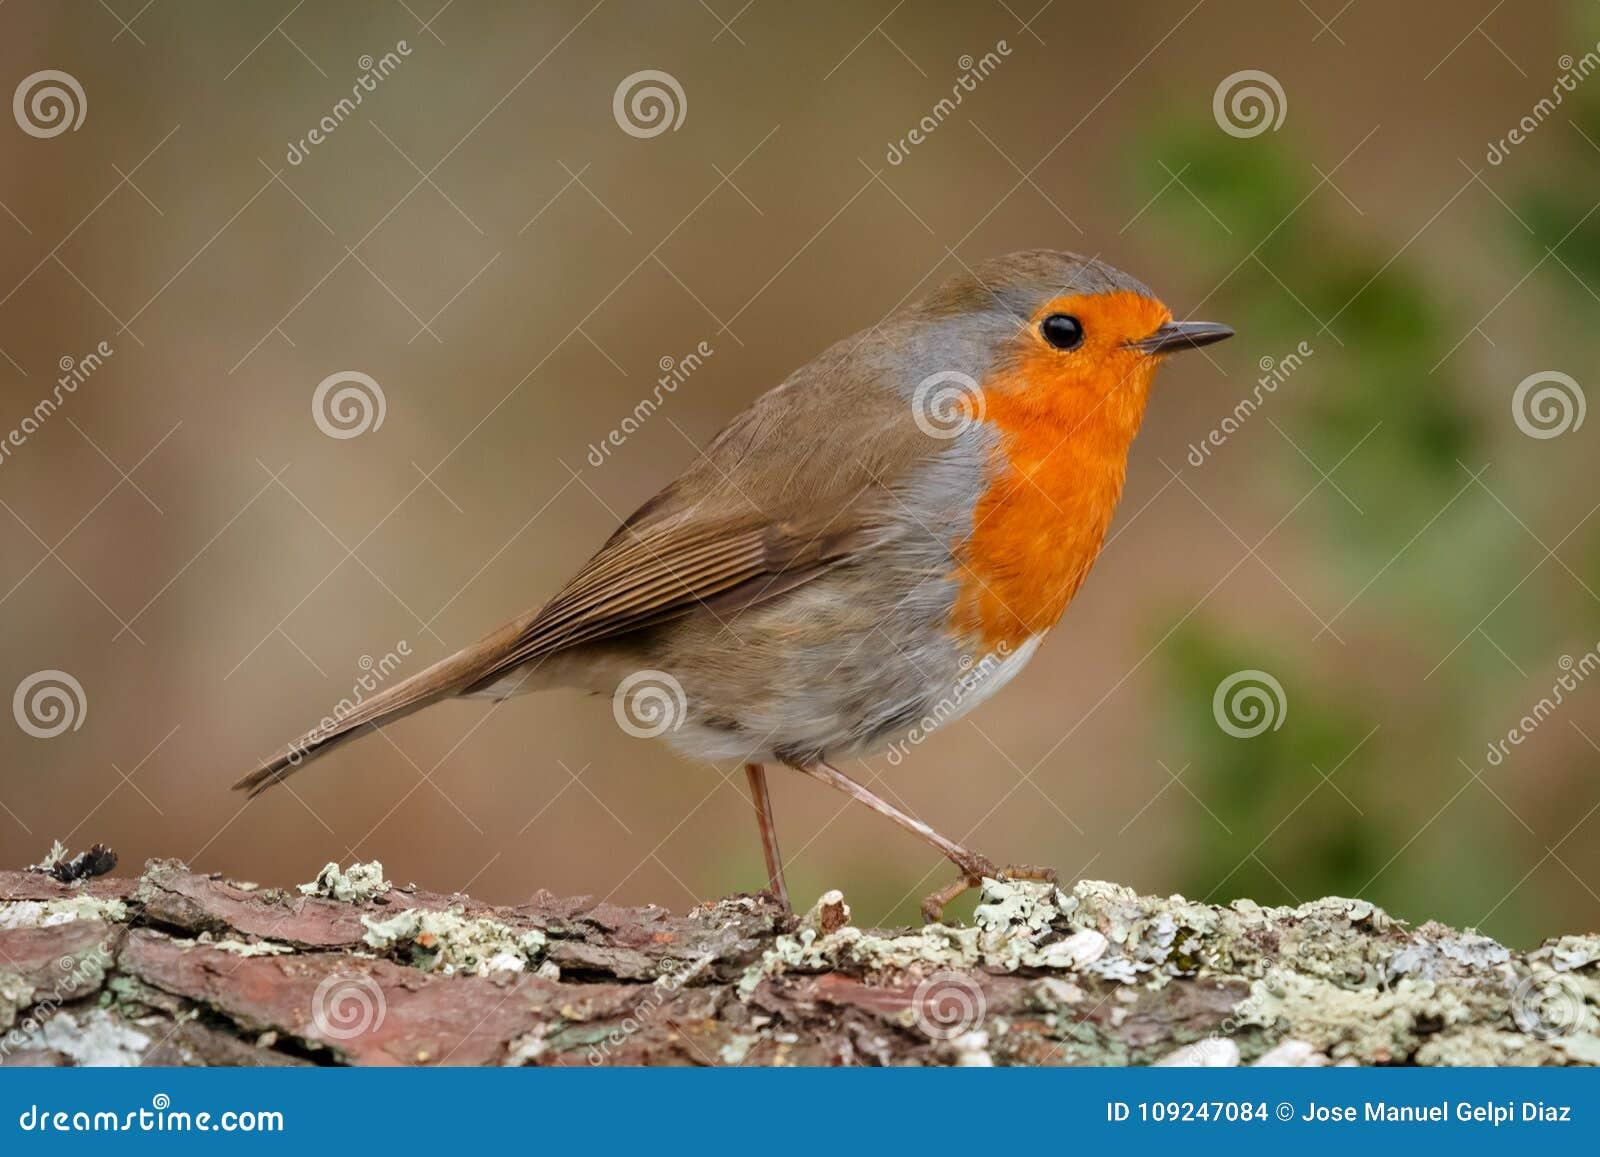 Mooie vogel met een aardig oranjerood gevederte